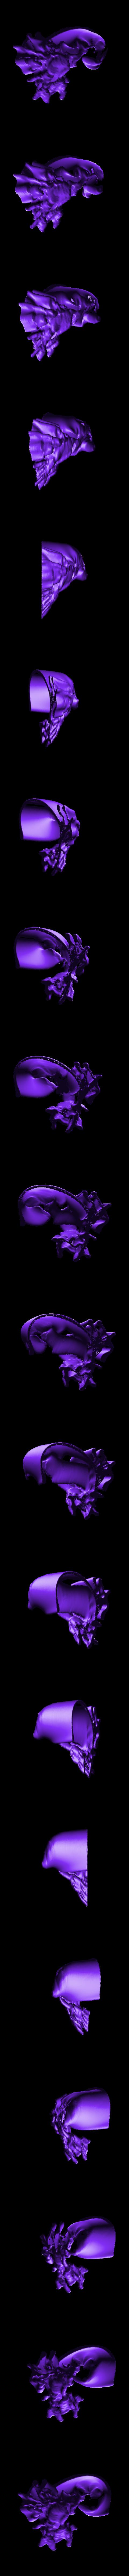 cave4.stl Download free STL file Weird terrain collection • 3D printer object, ferjerez3d